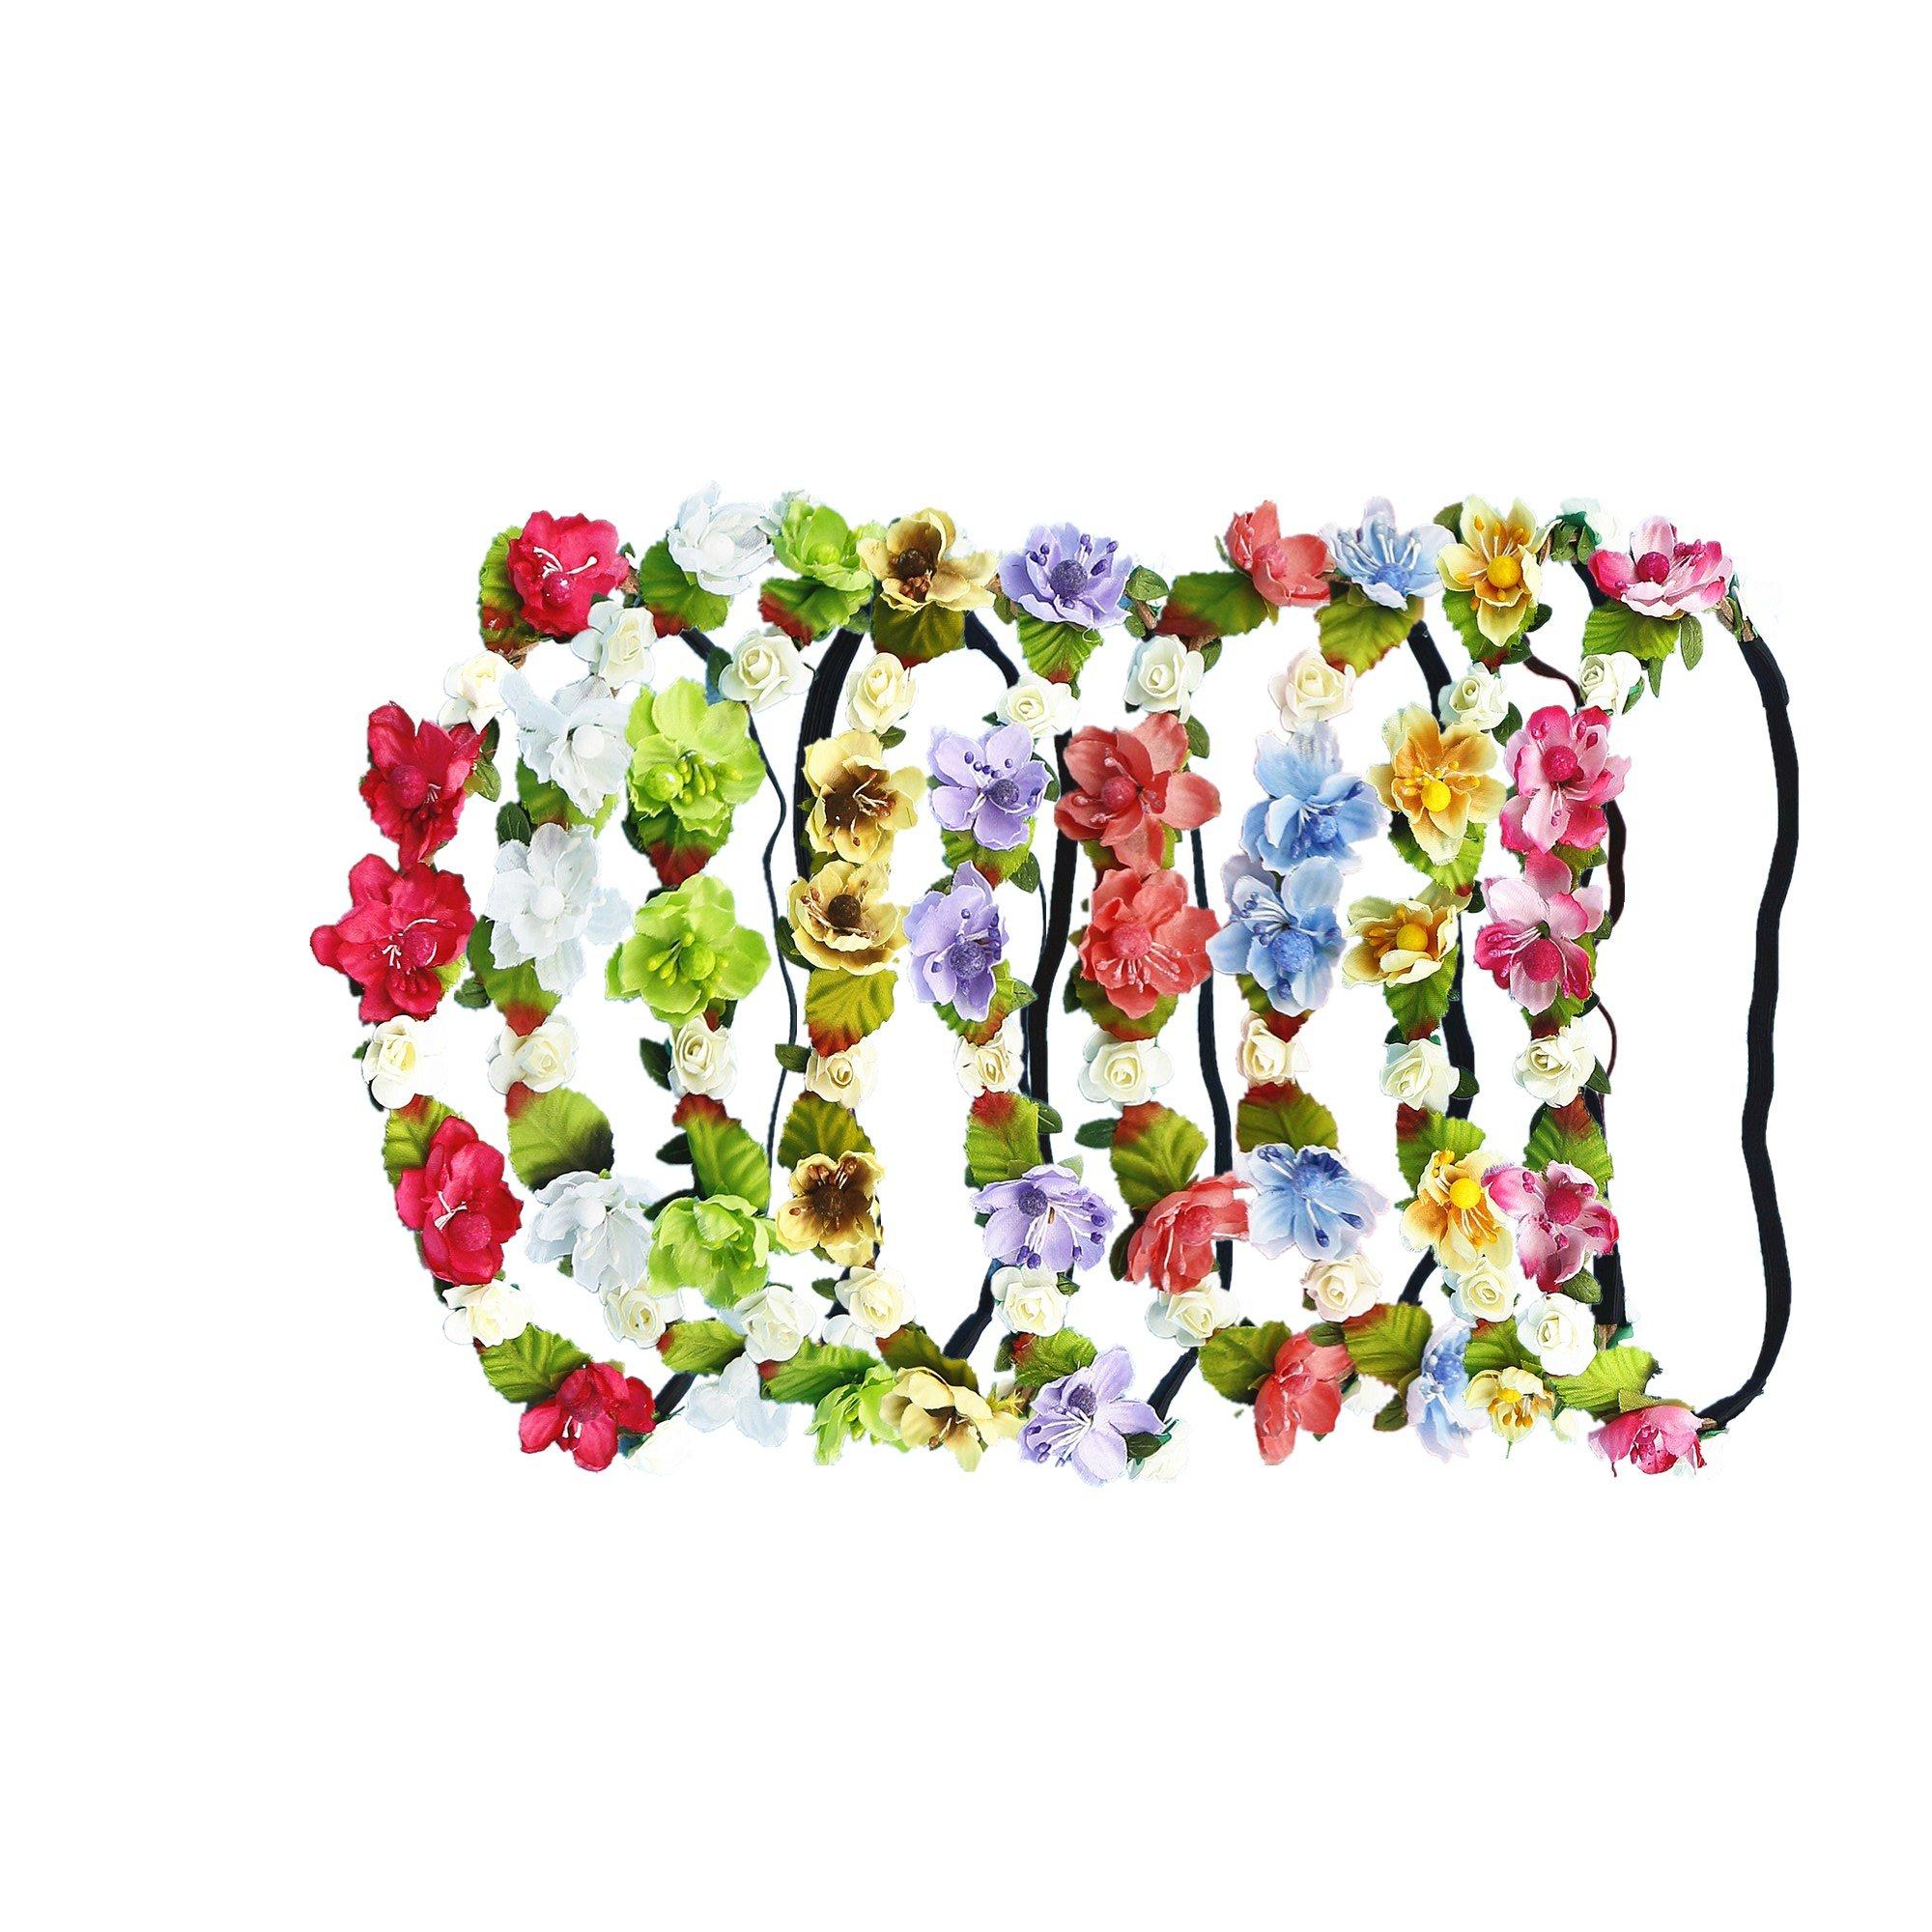 RIANCH 9 Pieces Multicolor Flower Headband Floral Wreath Crown Hairband BFS17-9B